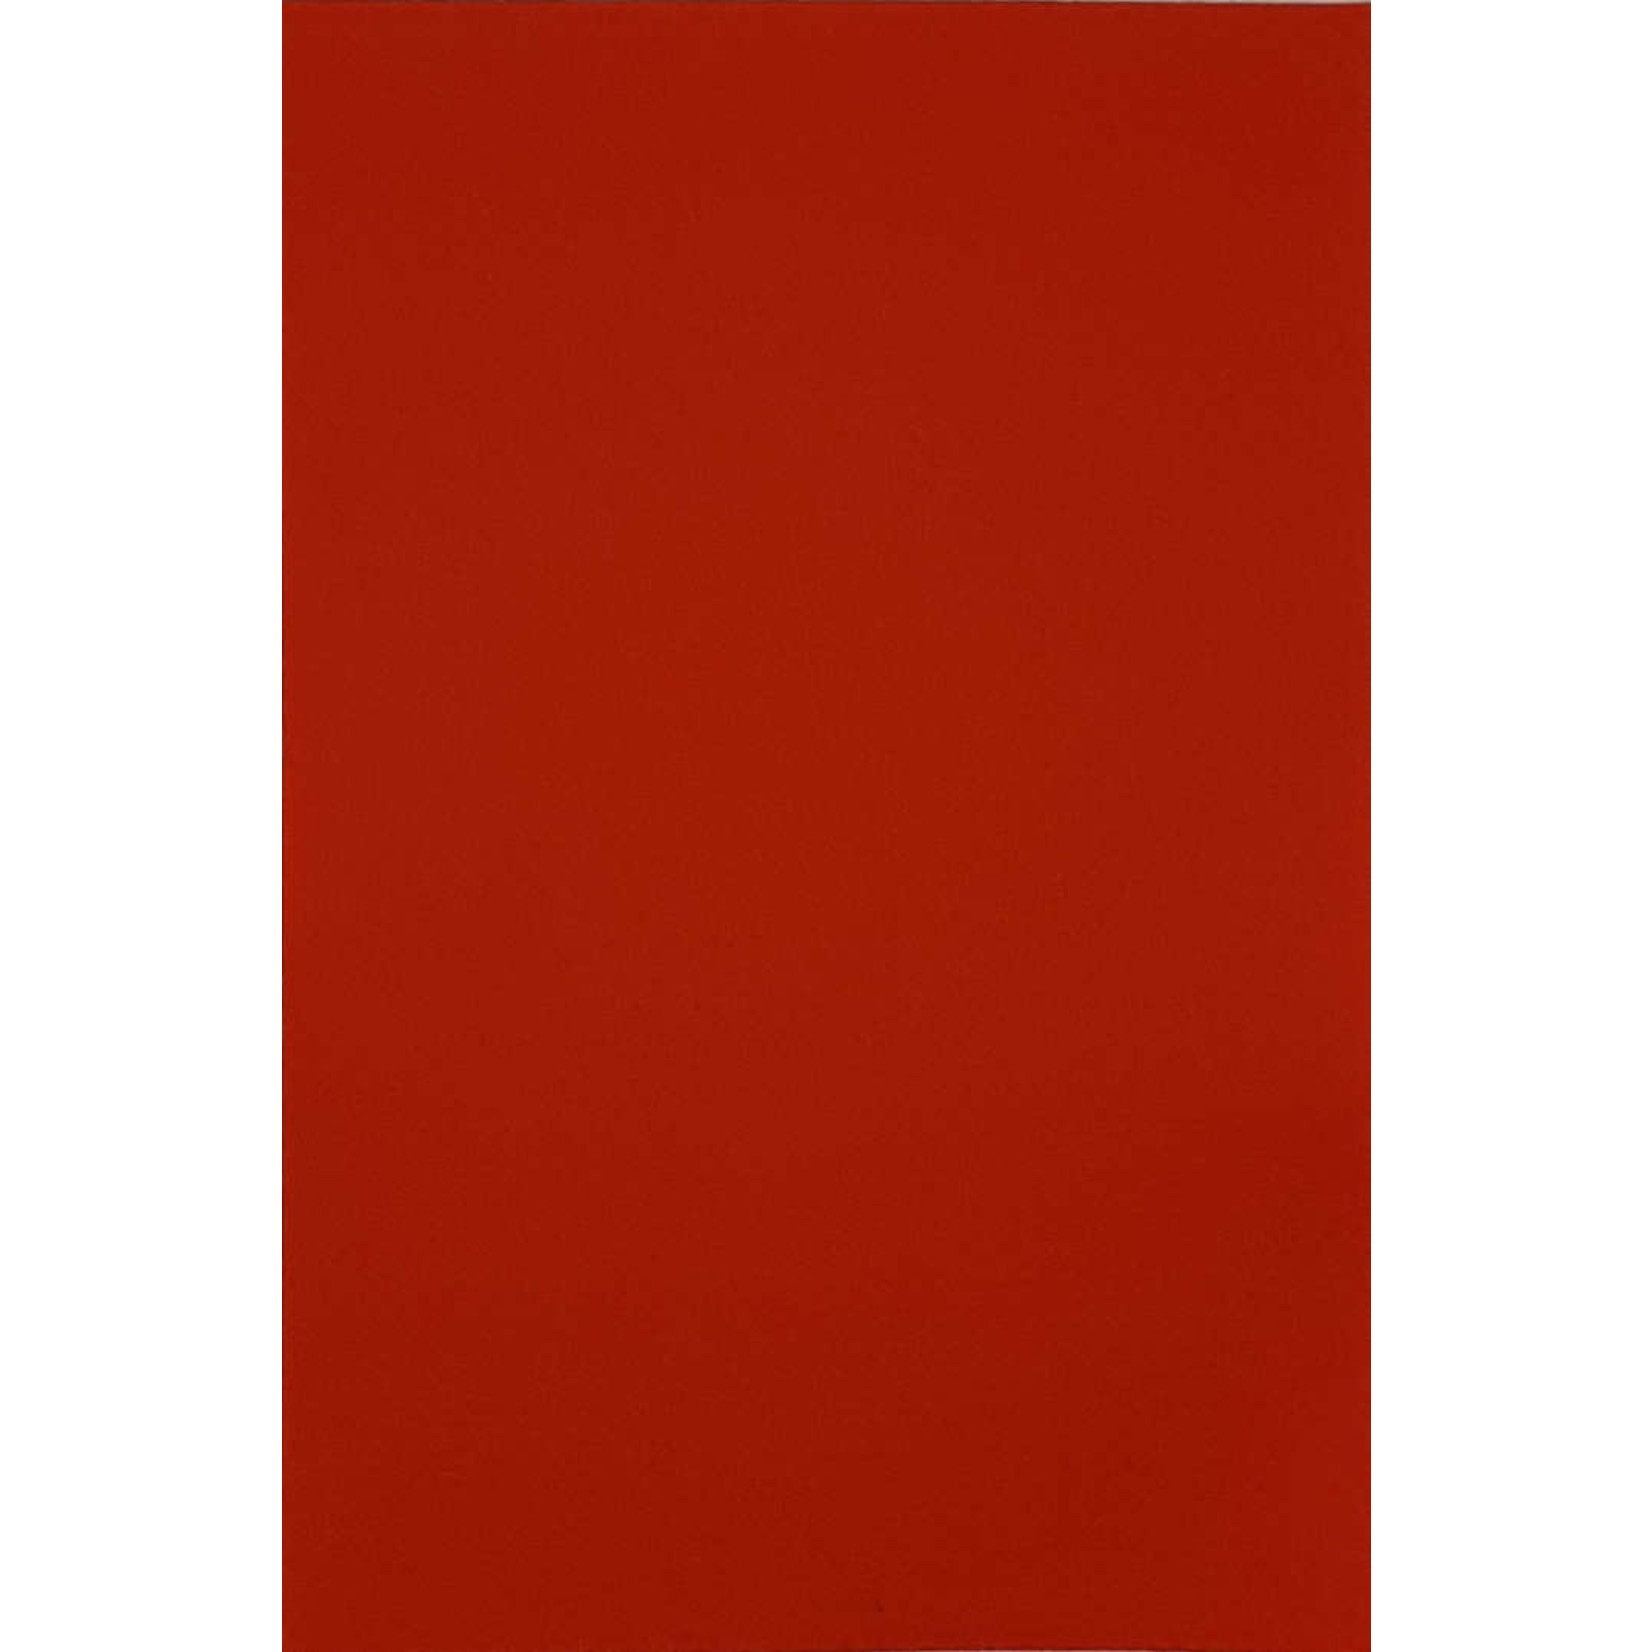 HollandFelt Wolvilt - lapje 20 x 30 cm. - kleur 06  Oranjerood - zuiver scheerwol- 1 mm. dik